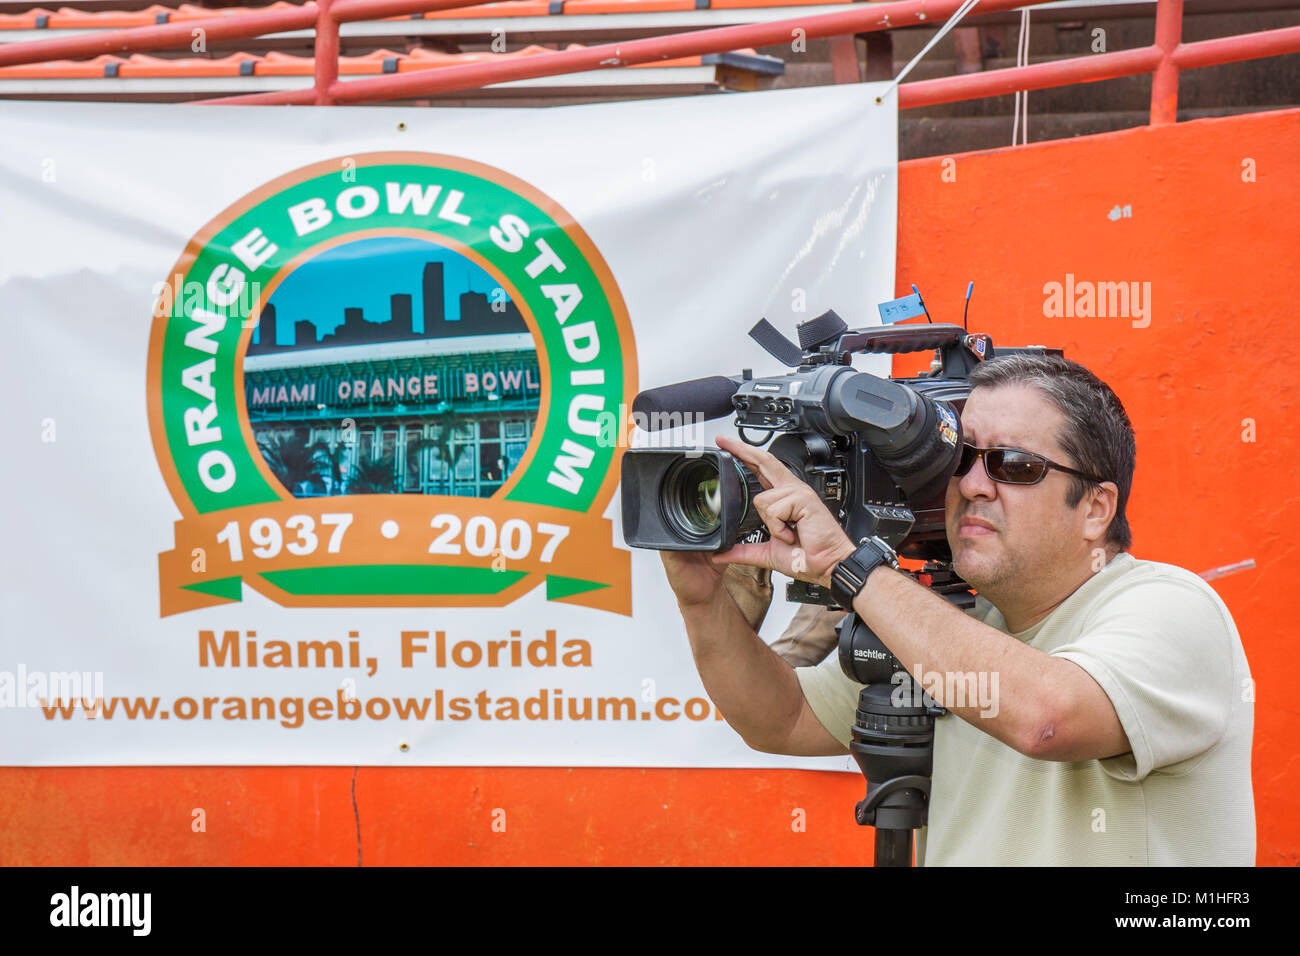 cameraman video cam recorder media Hispanic man banner - Stock Image